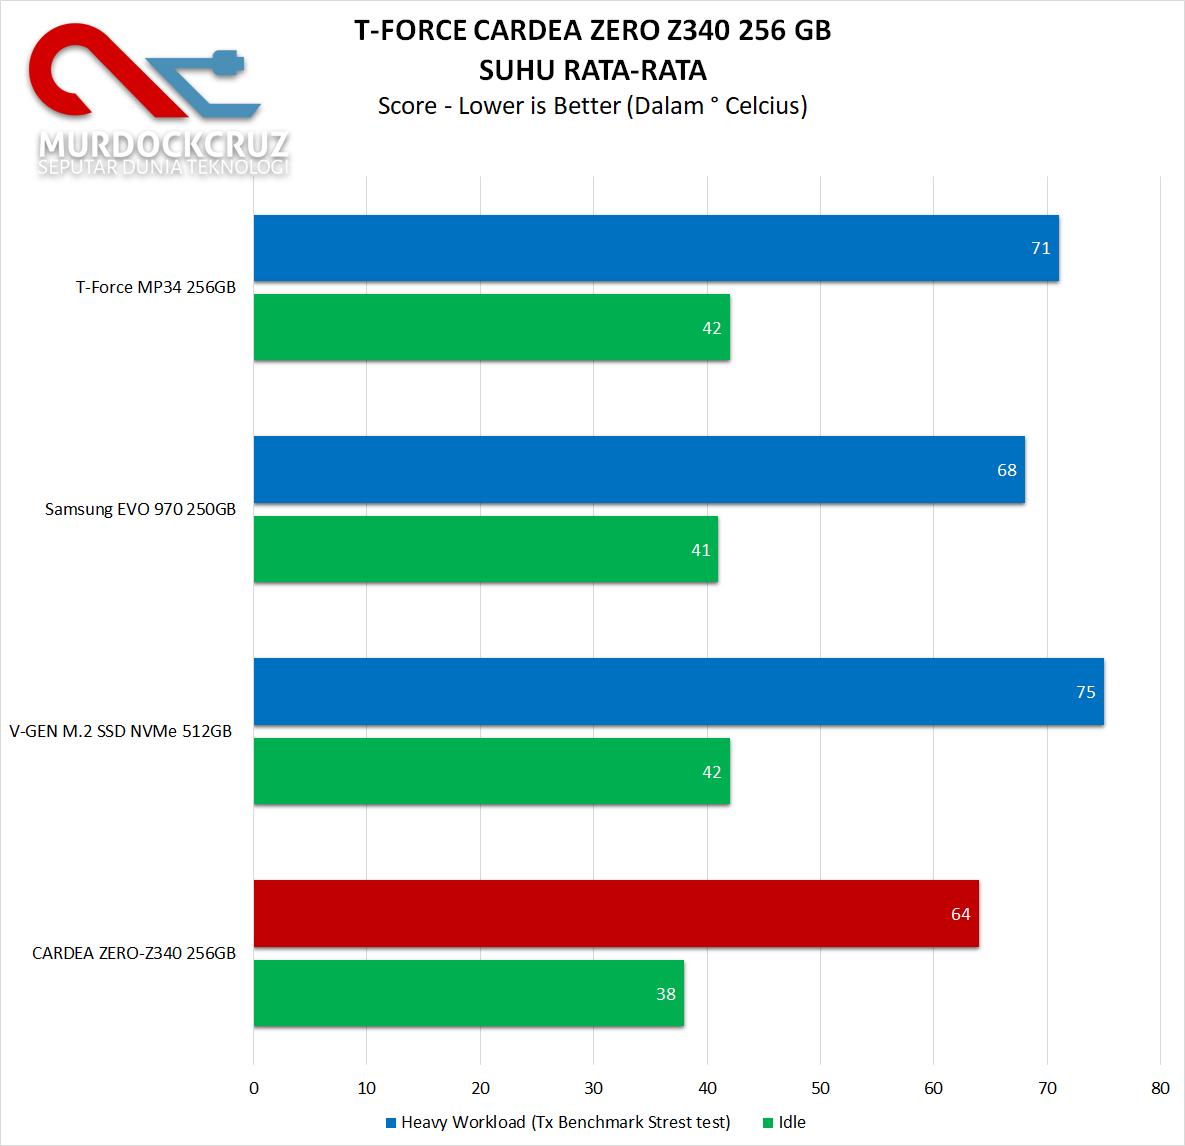 T-FORCE CARDEA ZERO Z340 PCIe M.2 SSD